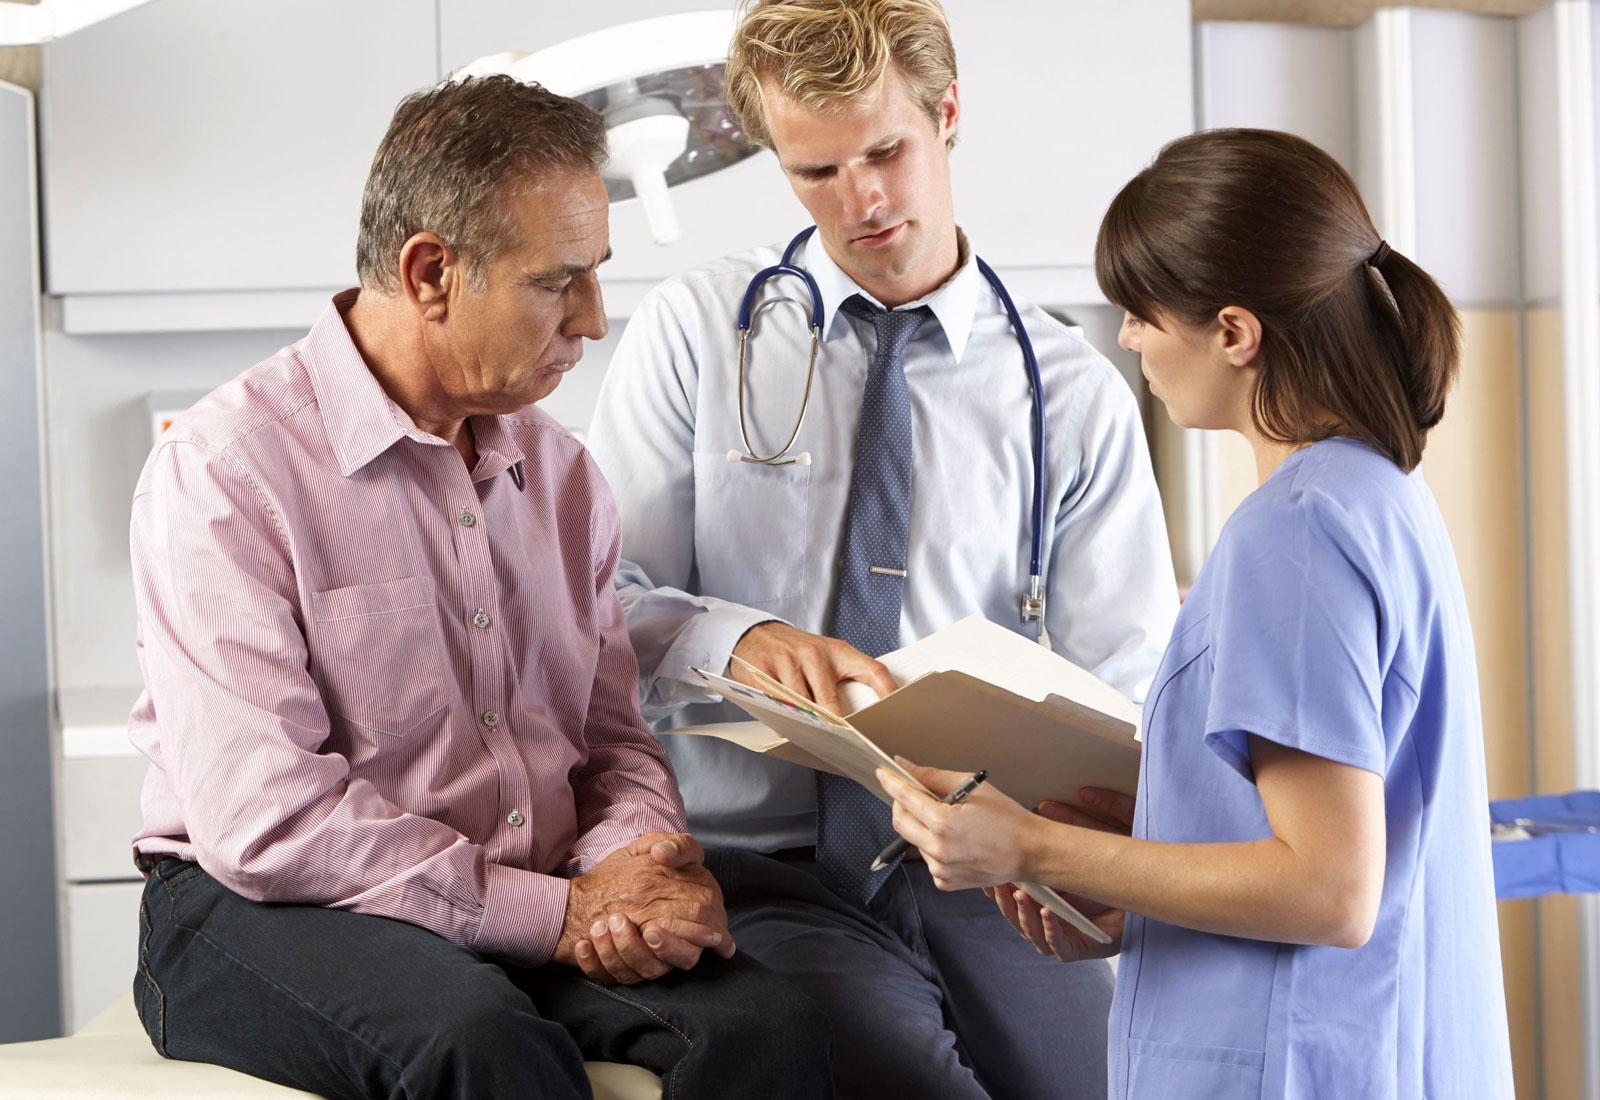 больные суставы лекарства